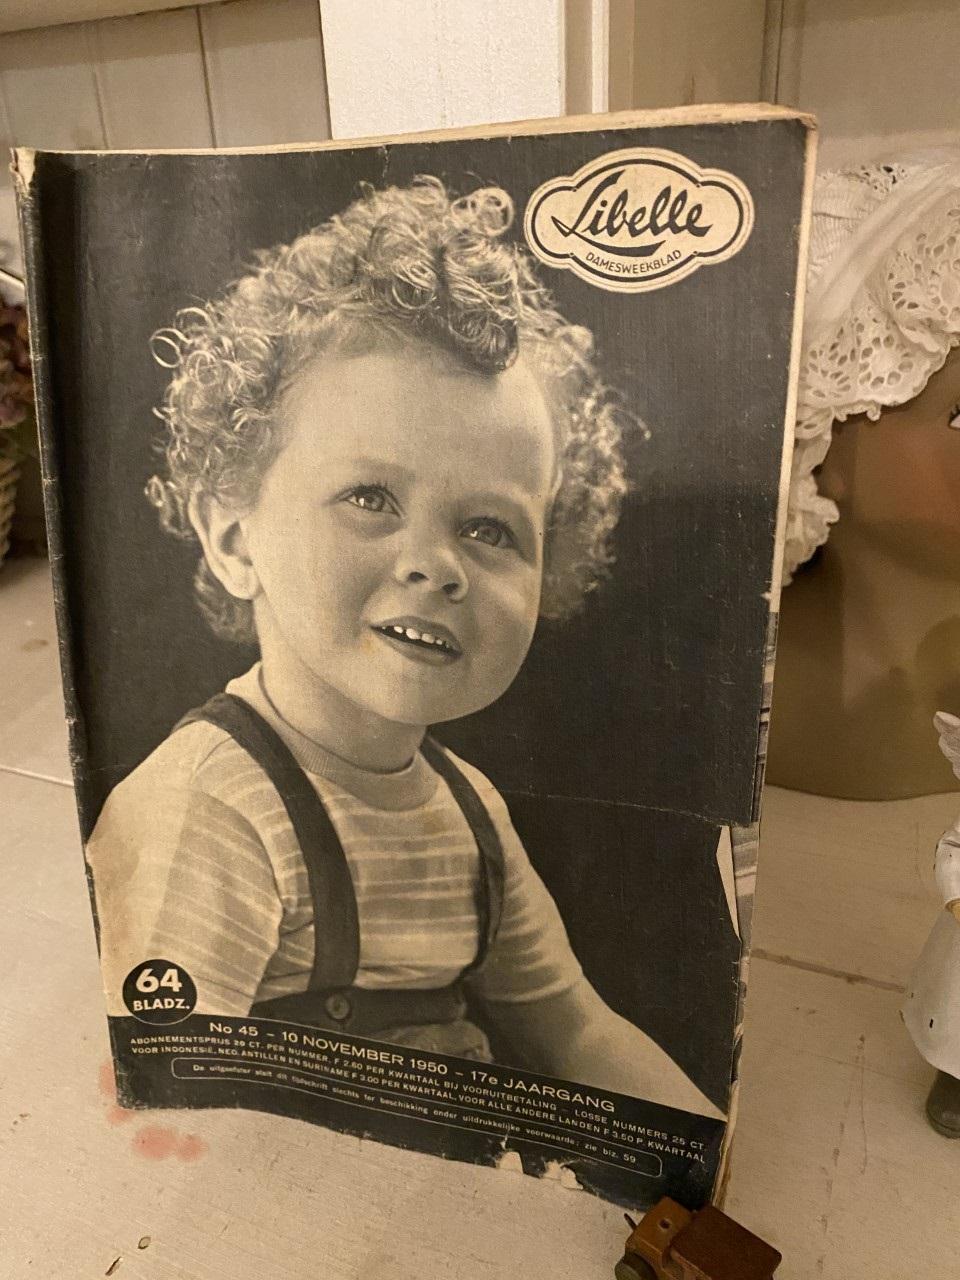 70 Jaar Oude Libelle Nr. 45, 10 November 1950 ,